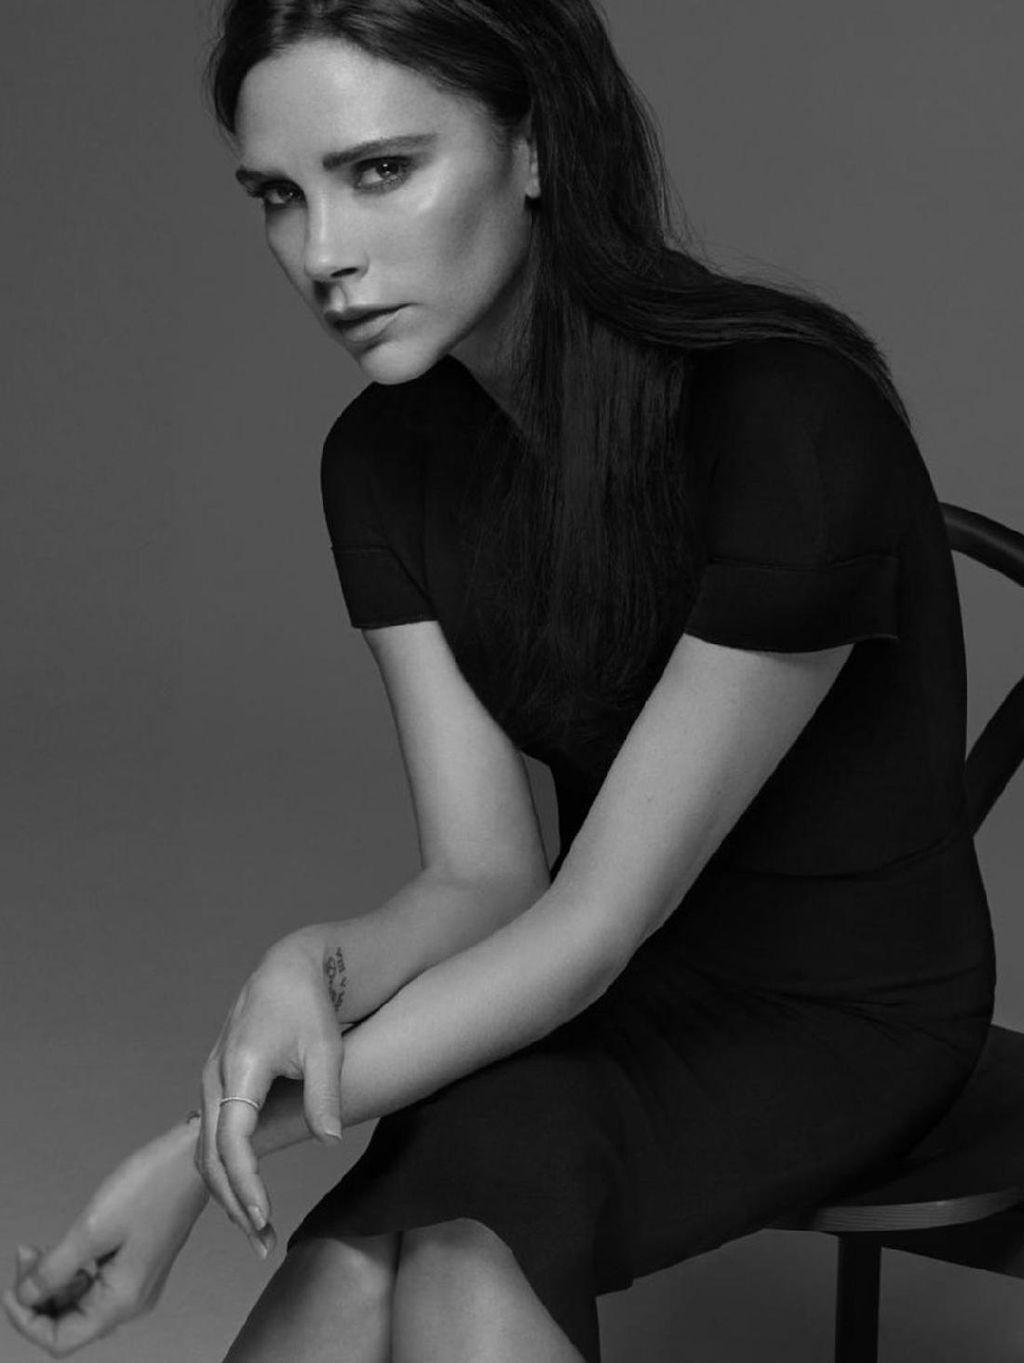 Victoria Beckham Rilis Koleksi Busana Untuk Wanita Plus Size